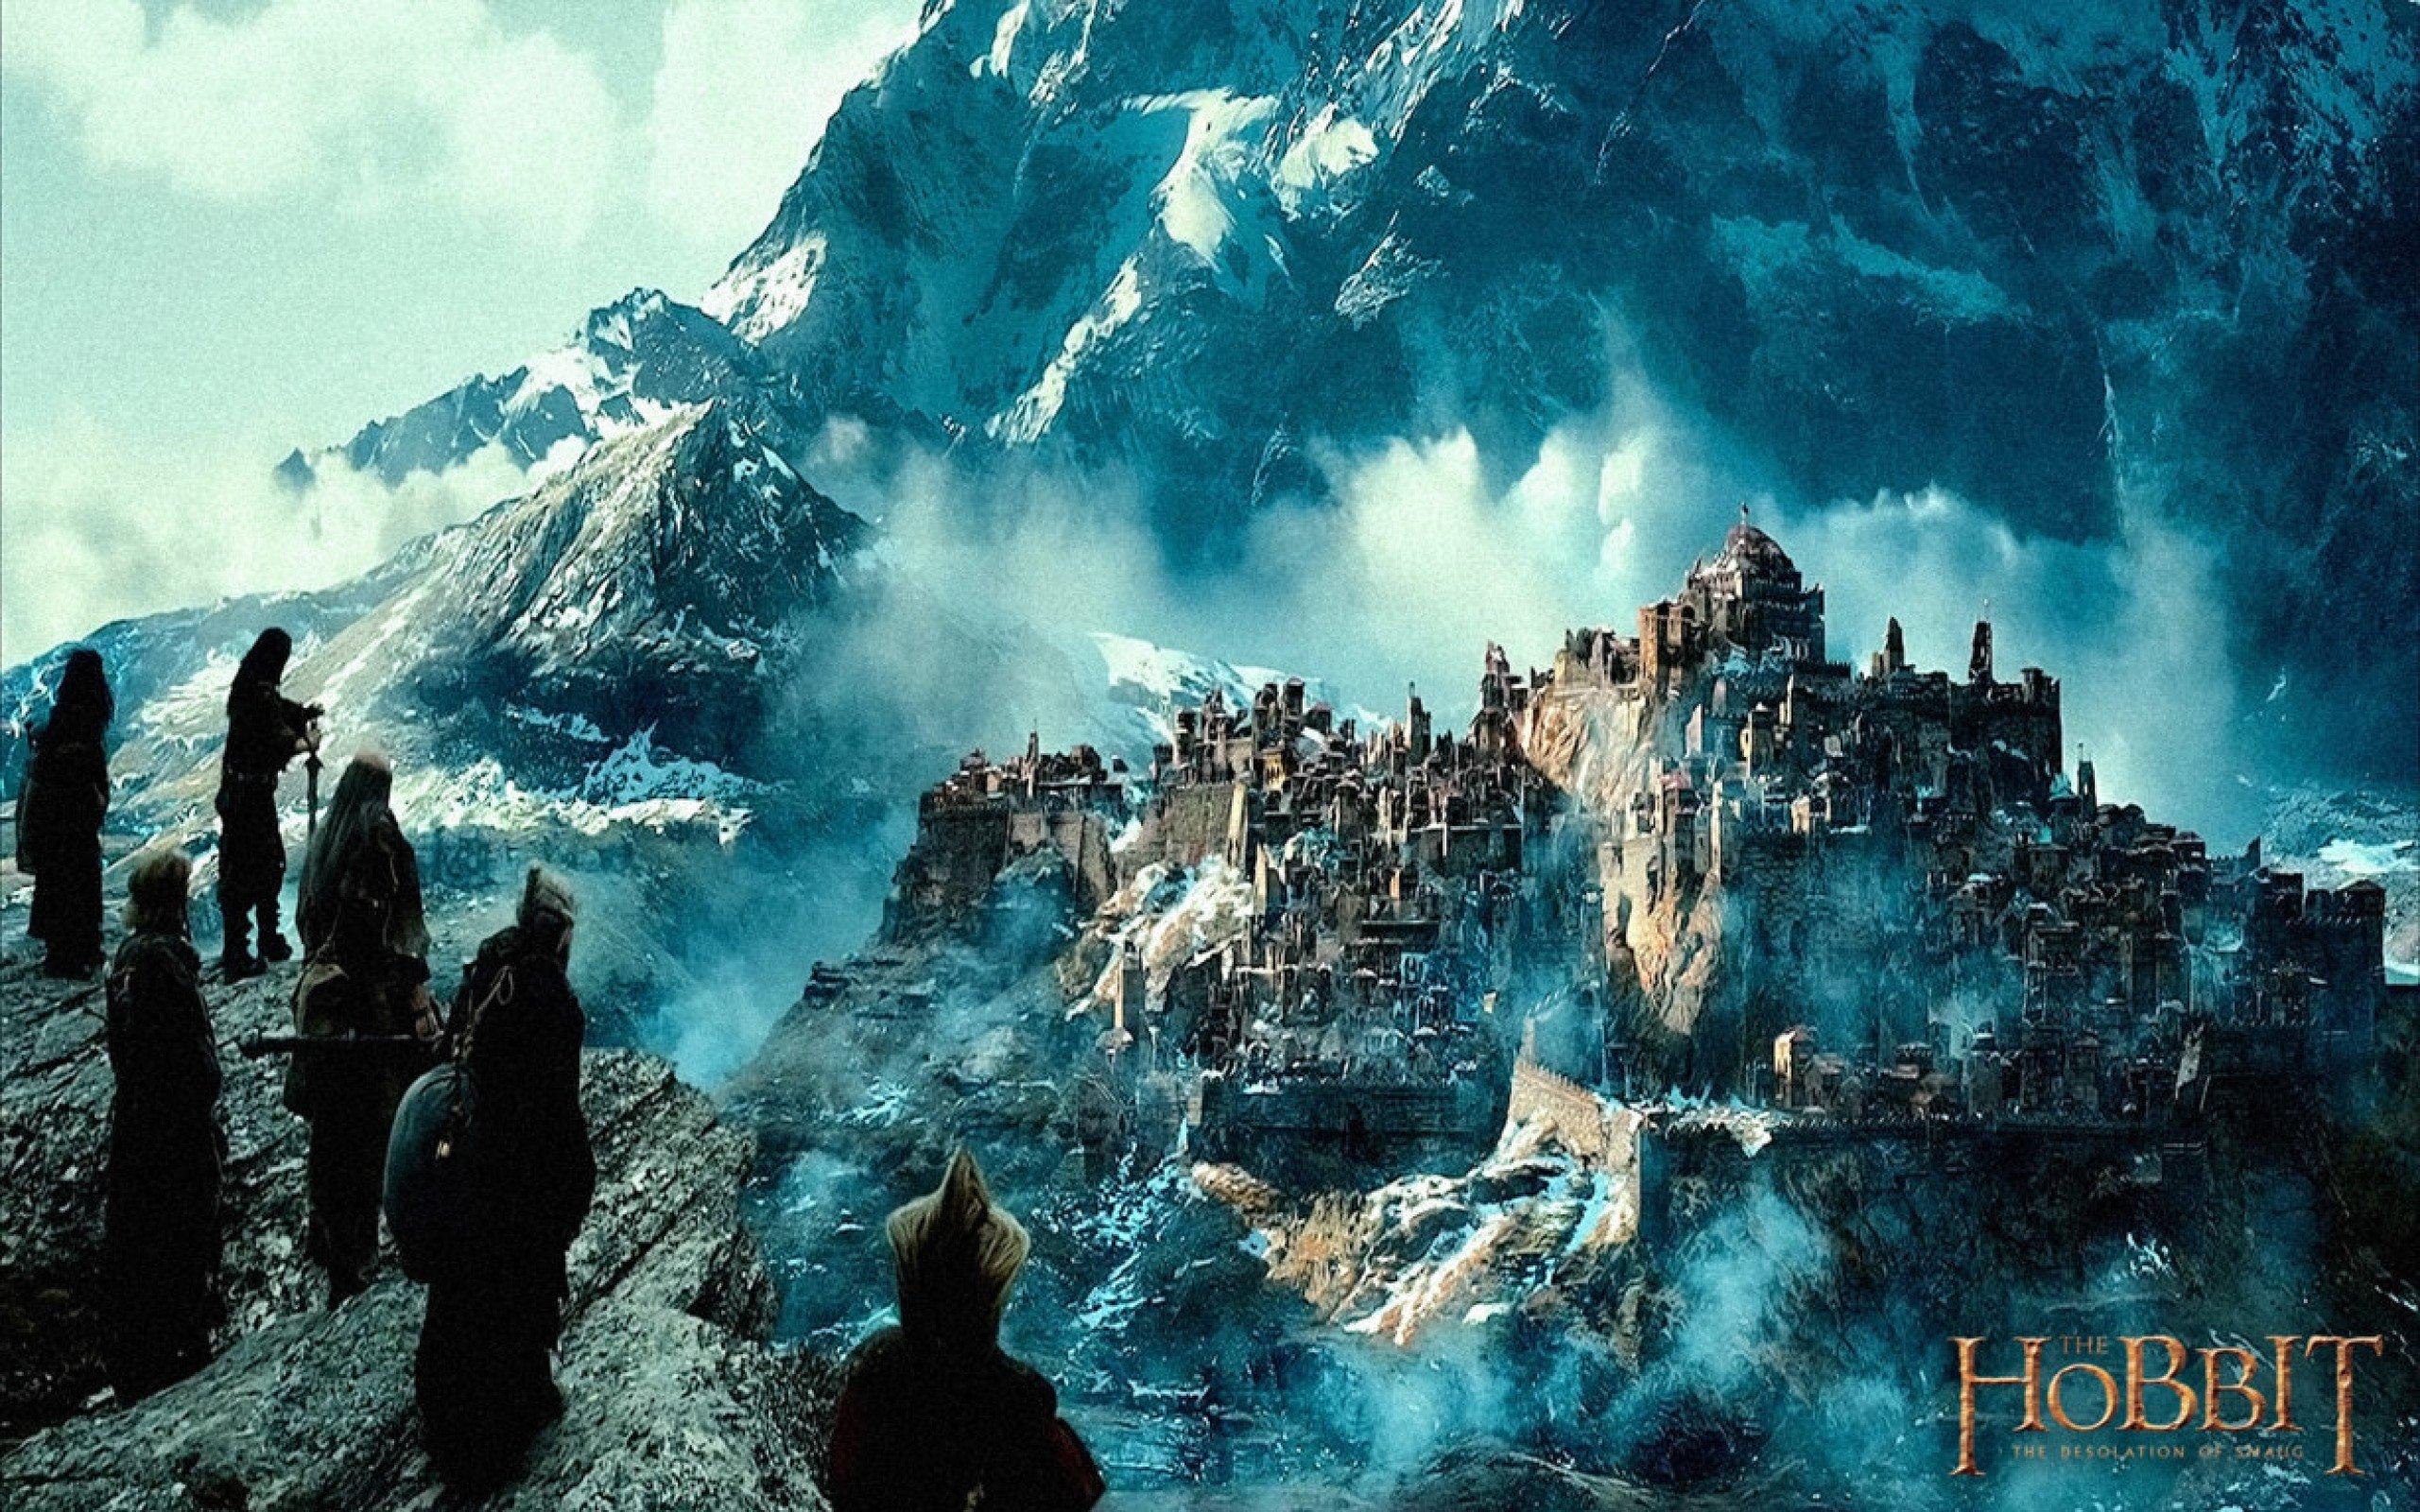 HOBBIT DESOLATION SMAUG lotr lord rings adventure fantasy ...